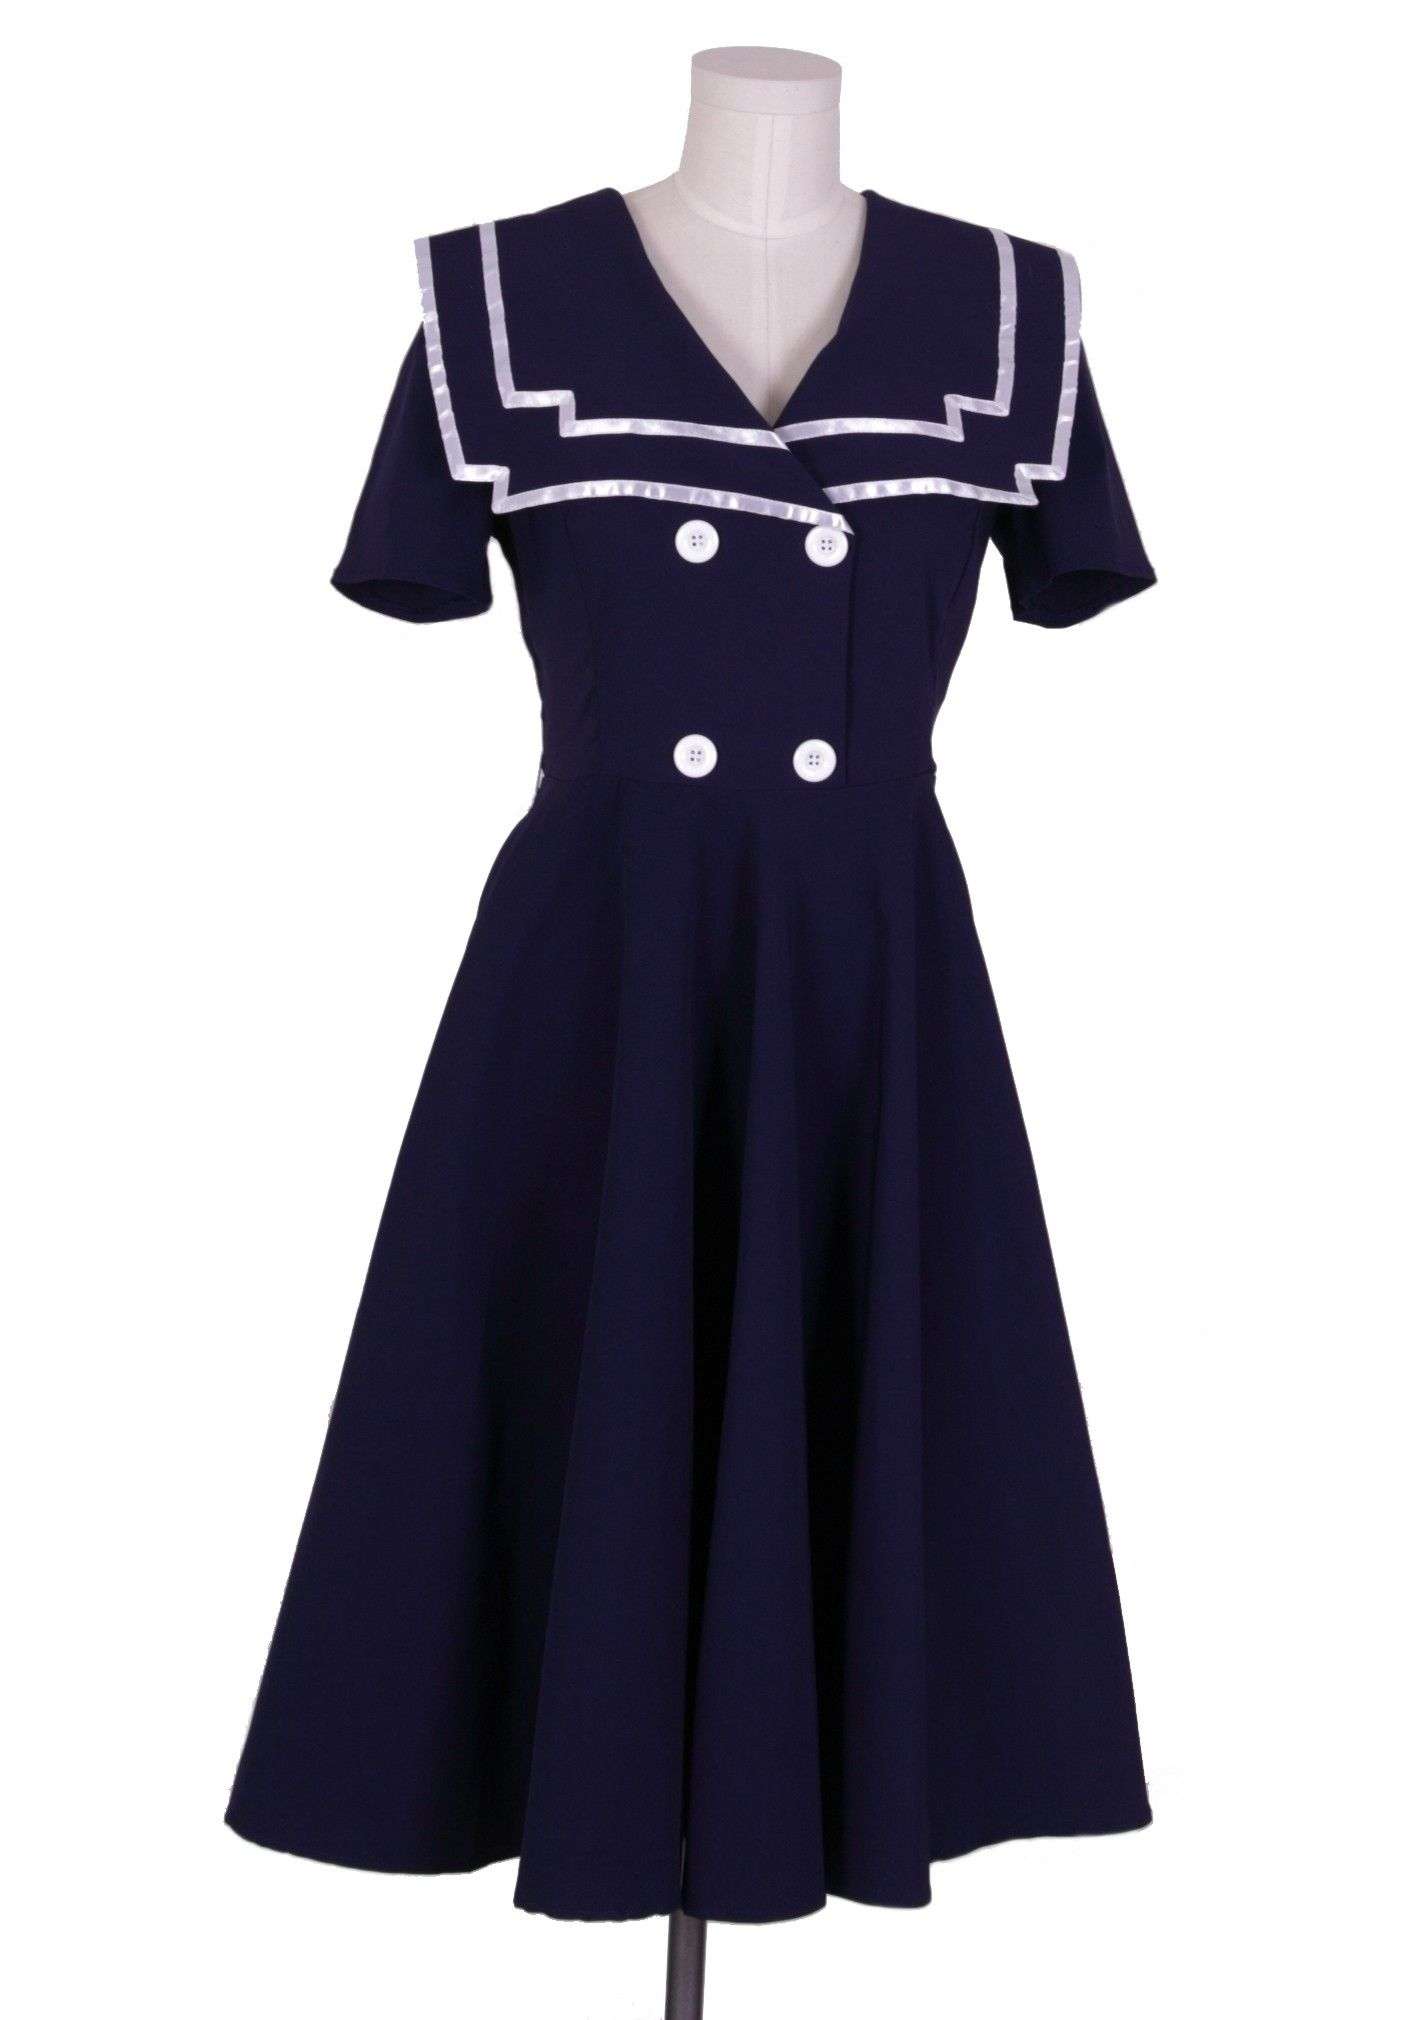 S sails through sophistication vintage navy dress s